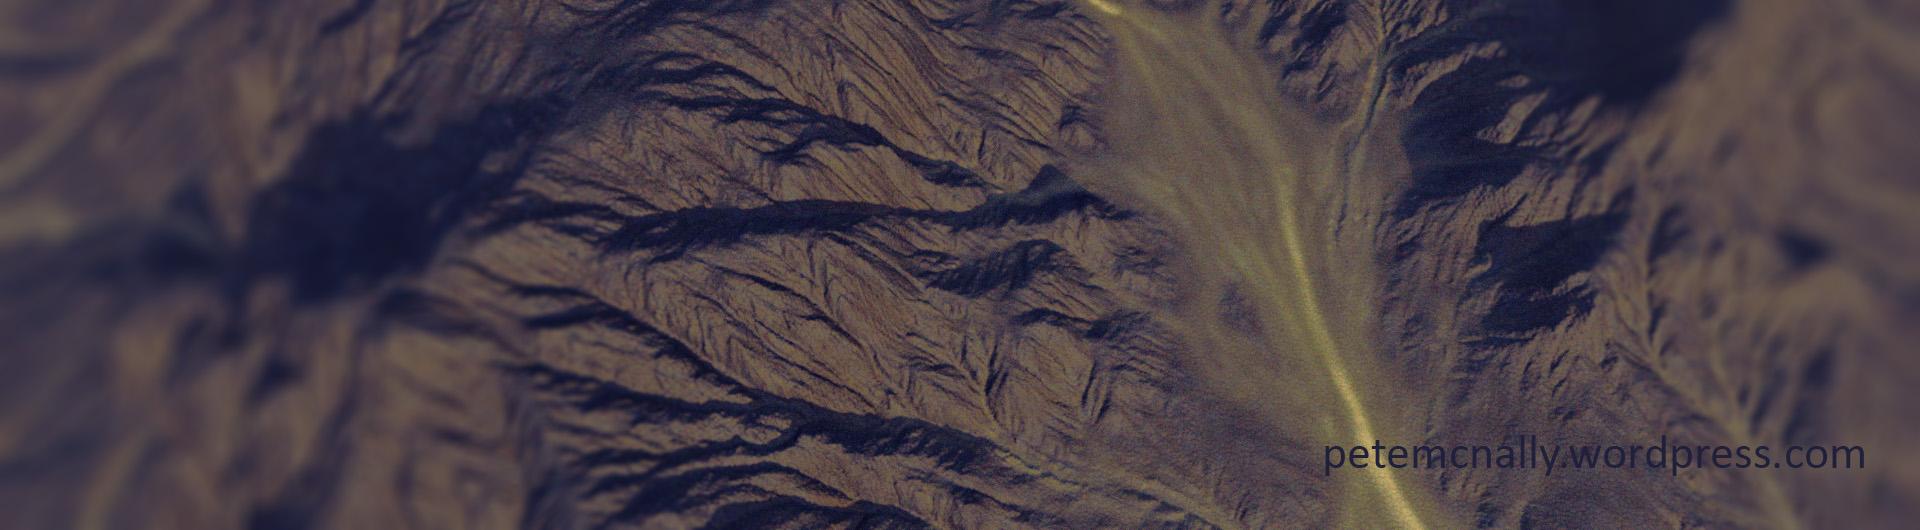 landscape | Pete Mc Nally's Blog